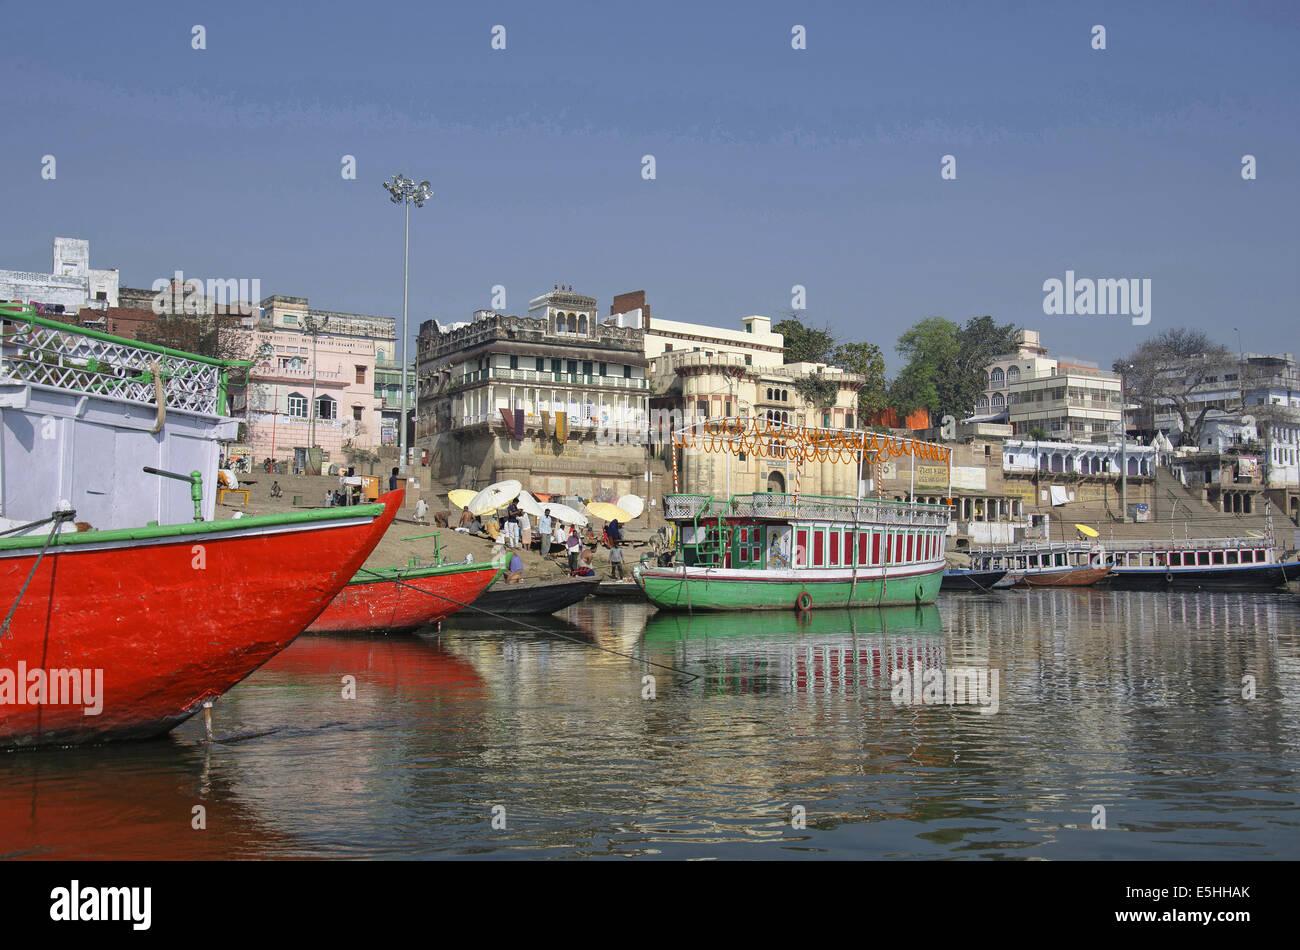 Ghats en el río Ganges, Varanasi, Benares, Uttar Pradesh, India Imagen De Stock